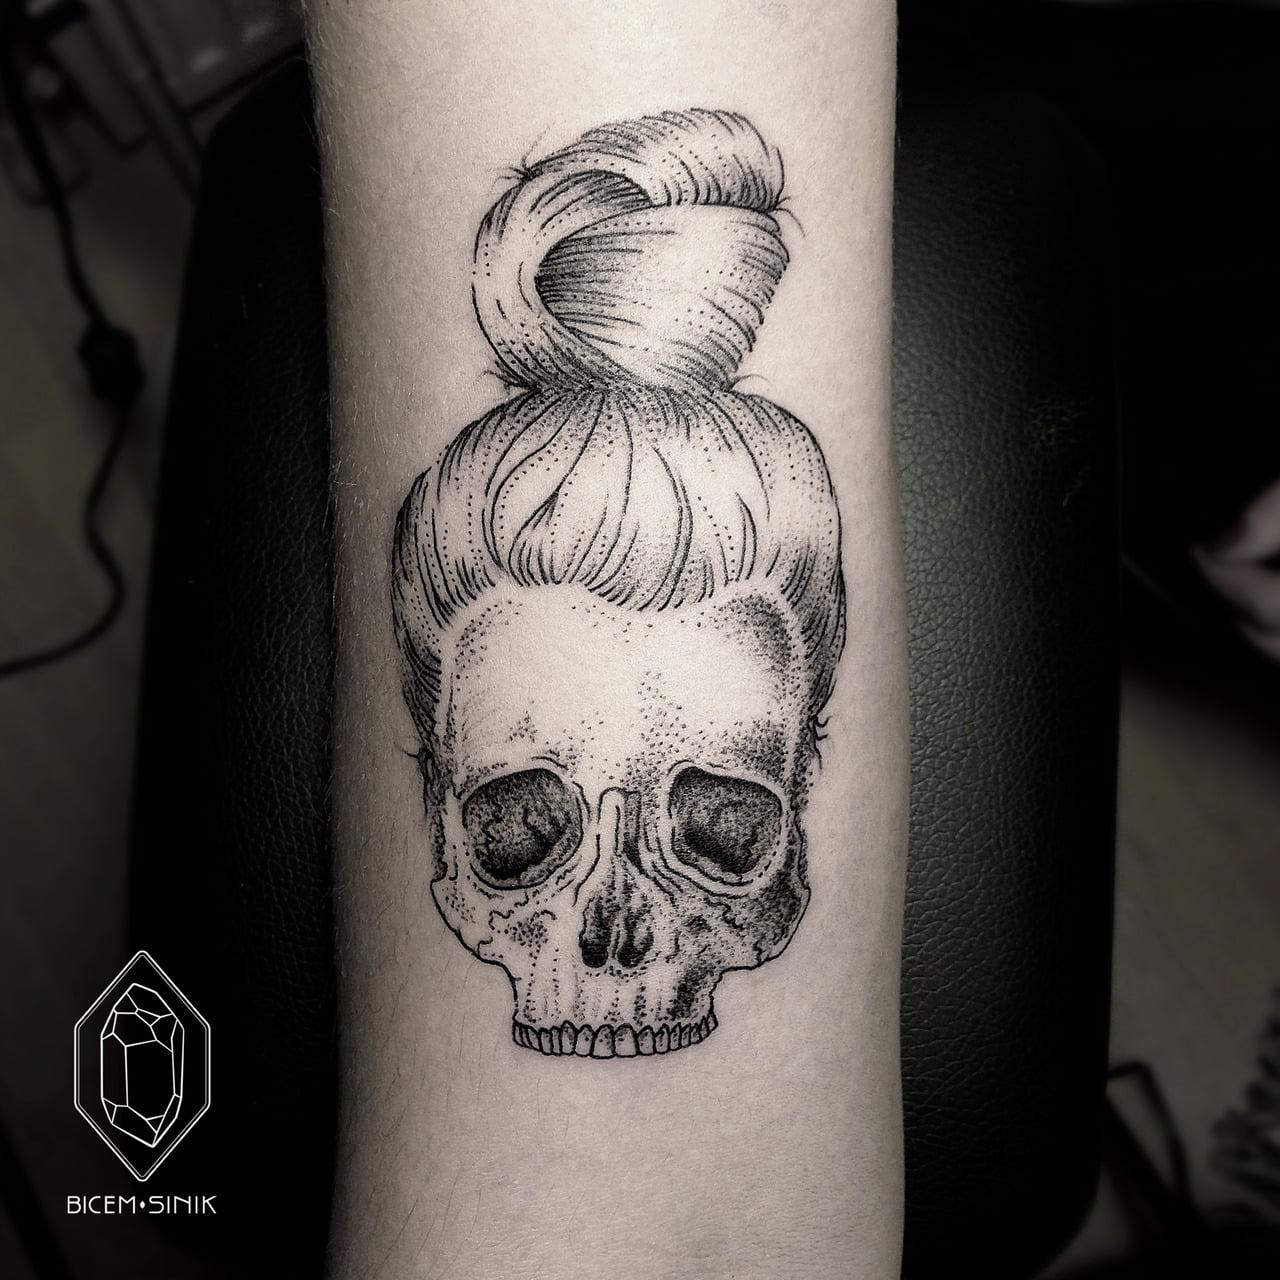 Tatuaje De Calavera Con Moño Tatuajesxd